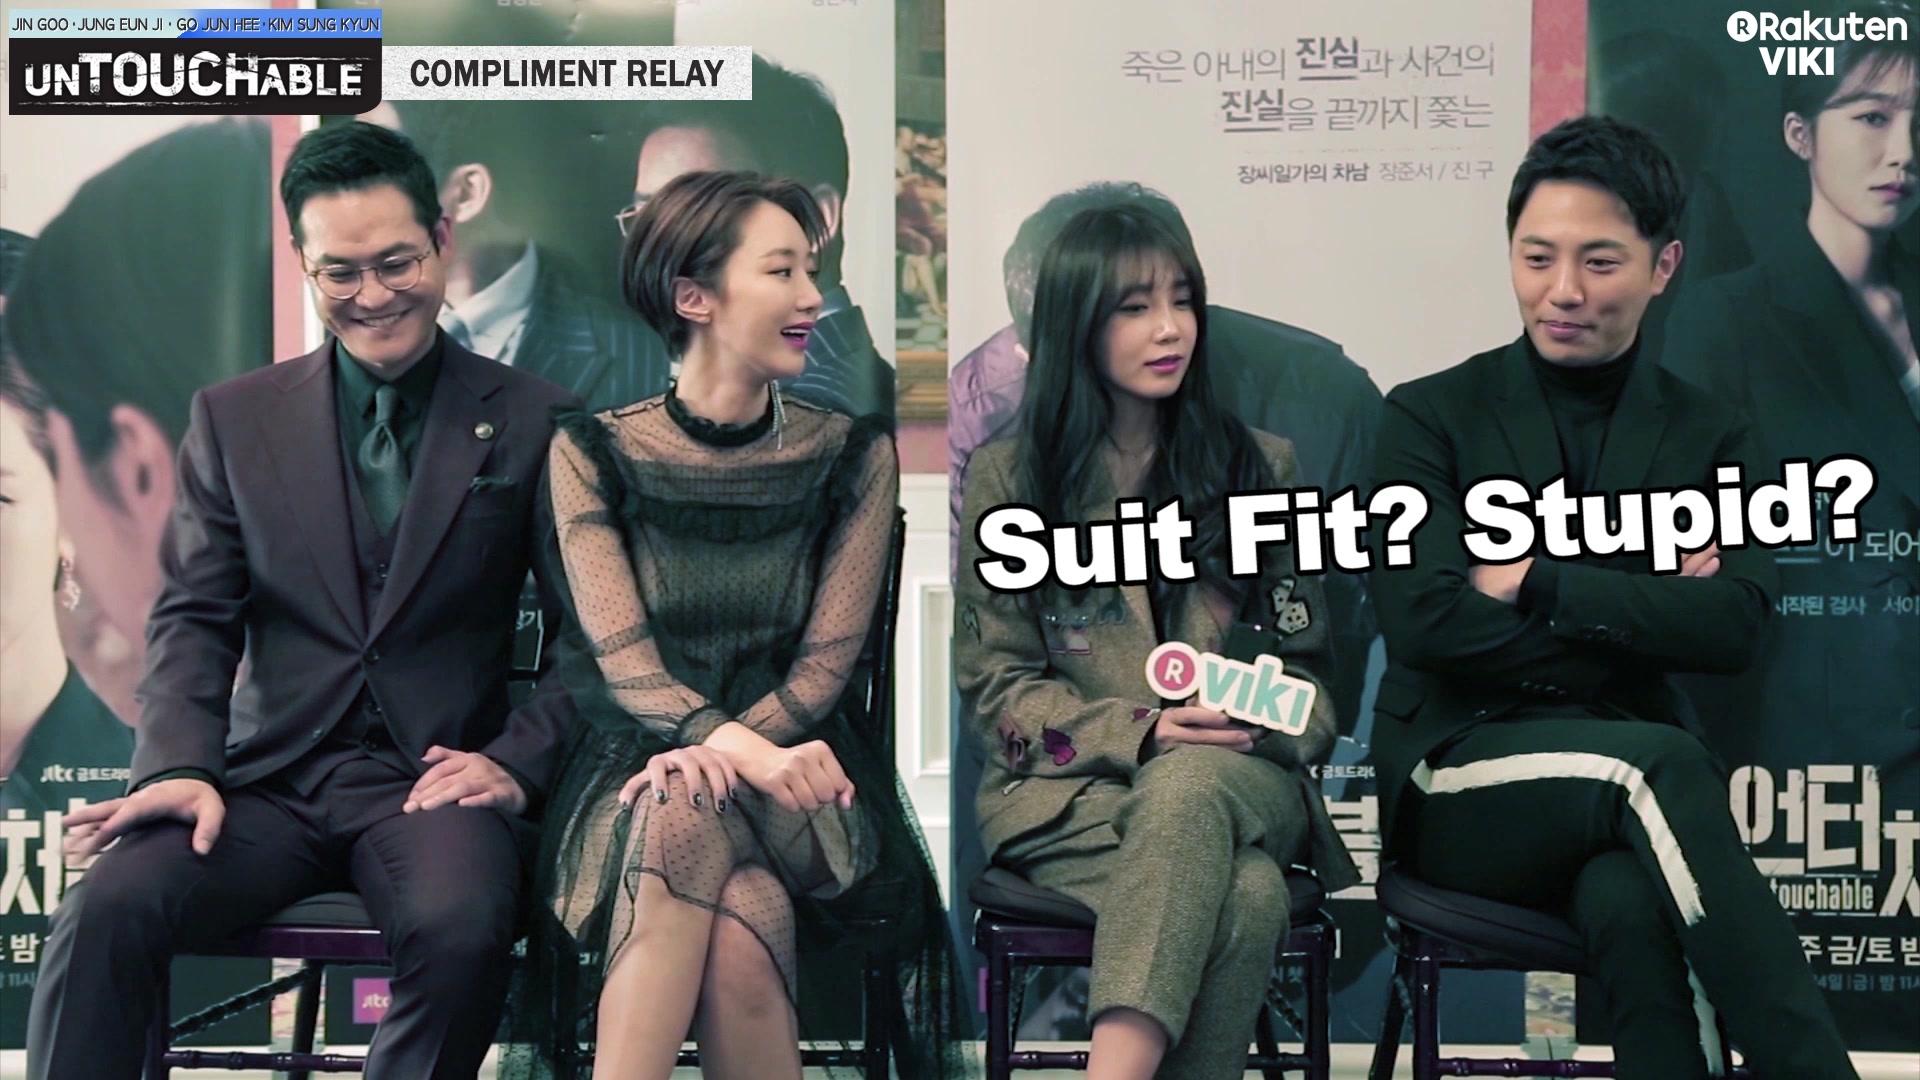 Untouchable Episode 1 - 언터처블 - Watch Full Episodes Free - Korea